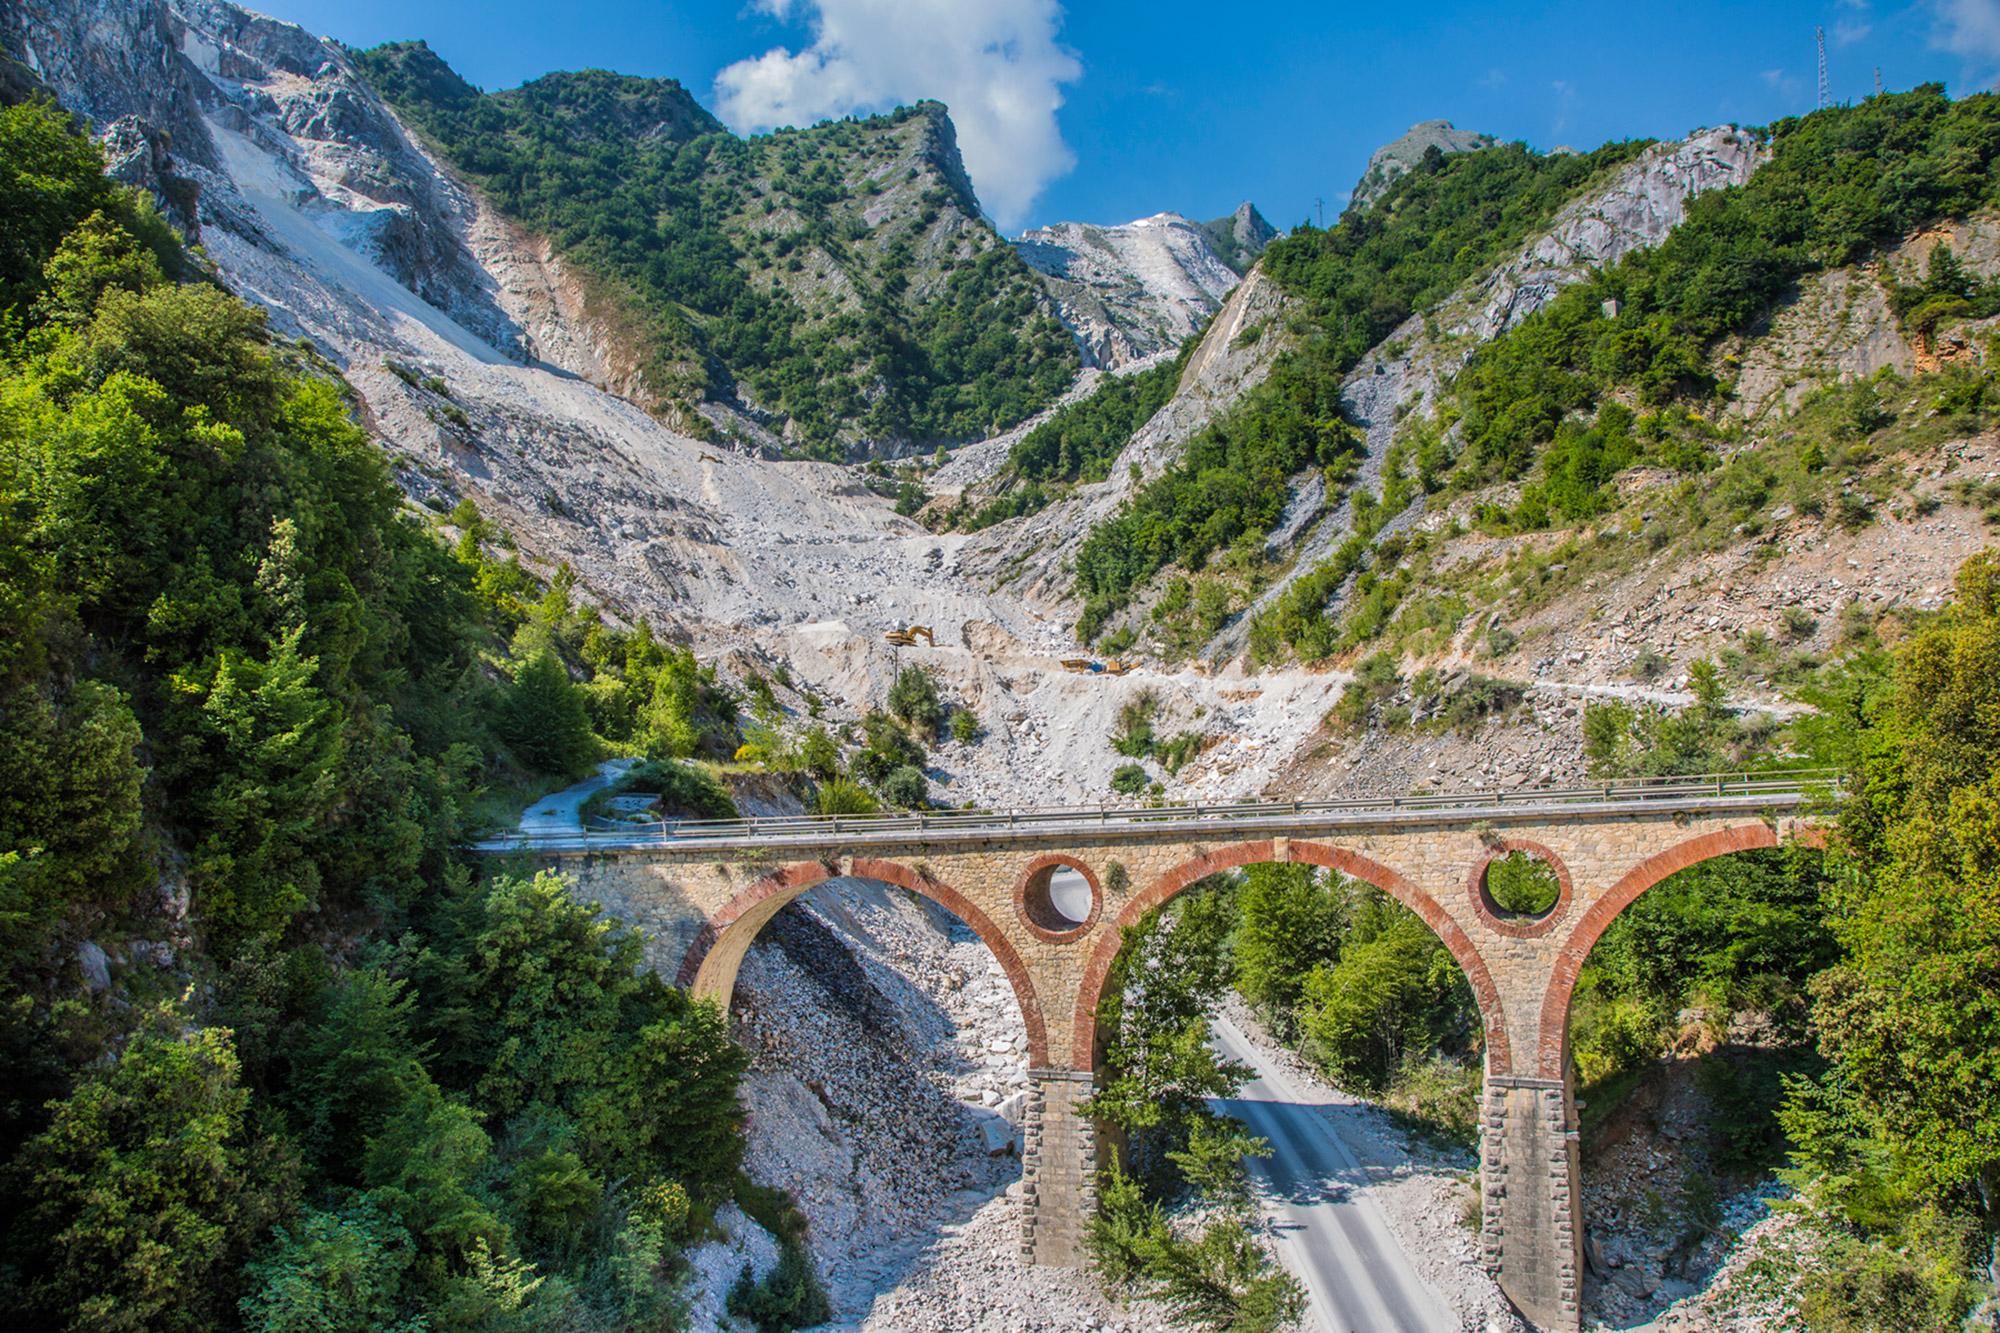 Carrara-Fantiscritti-Ponte-di-Varo-Tuscany-Study-1.jpg